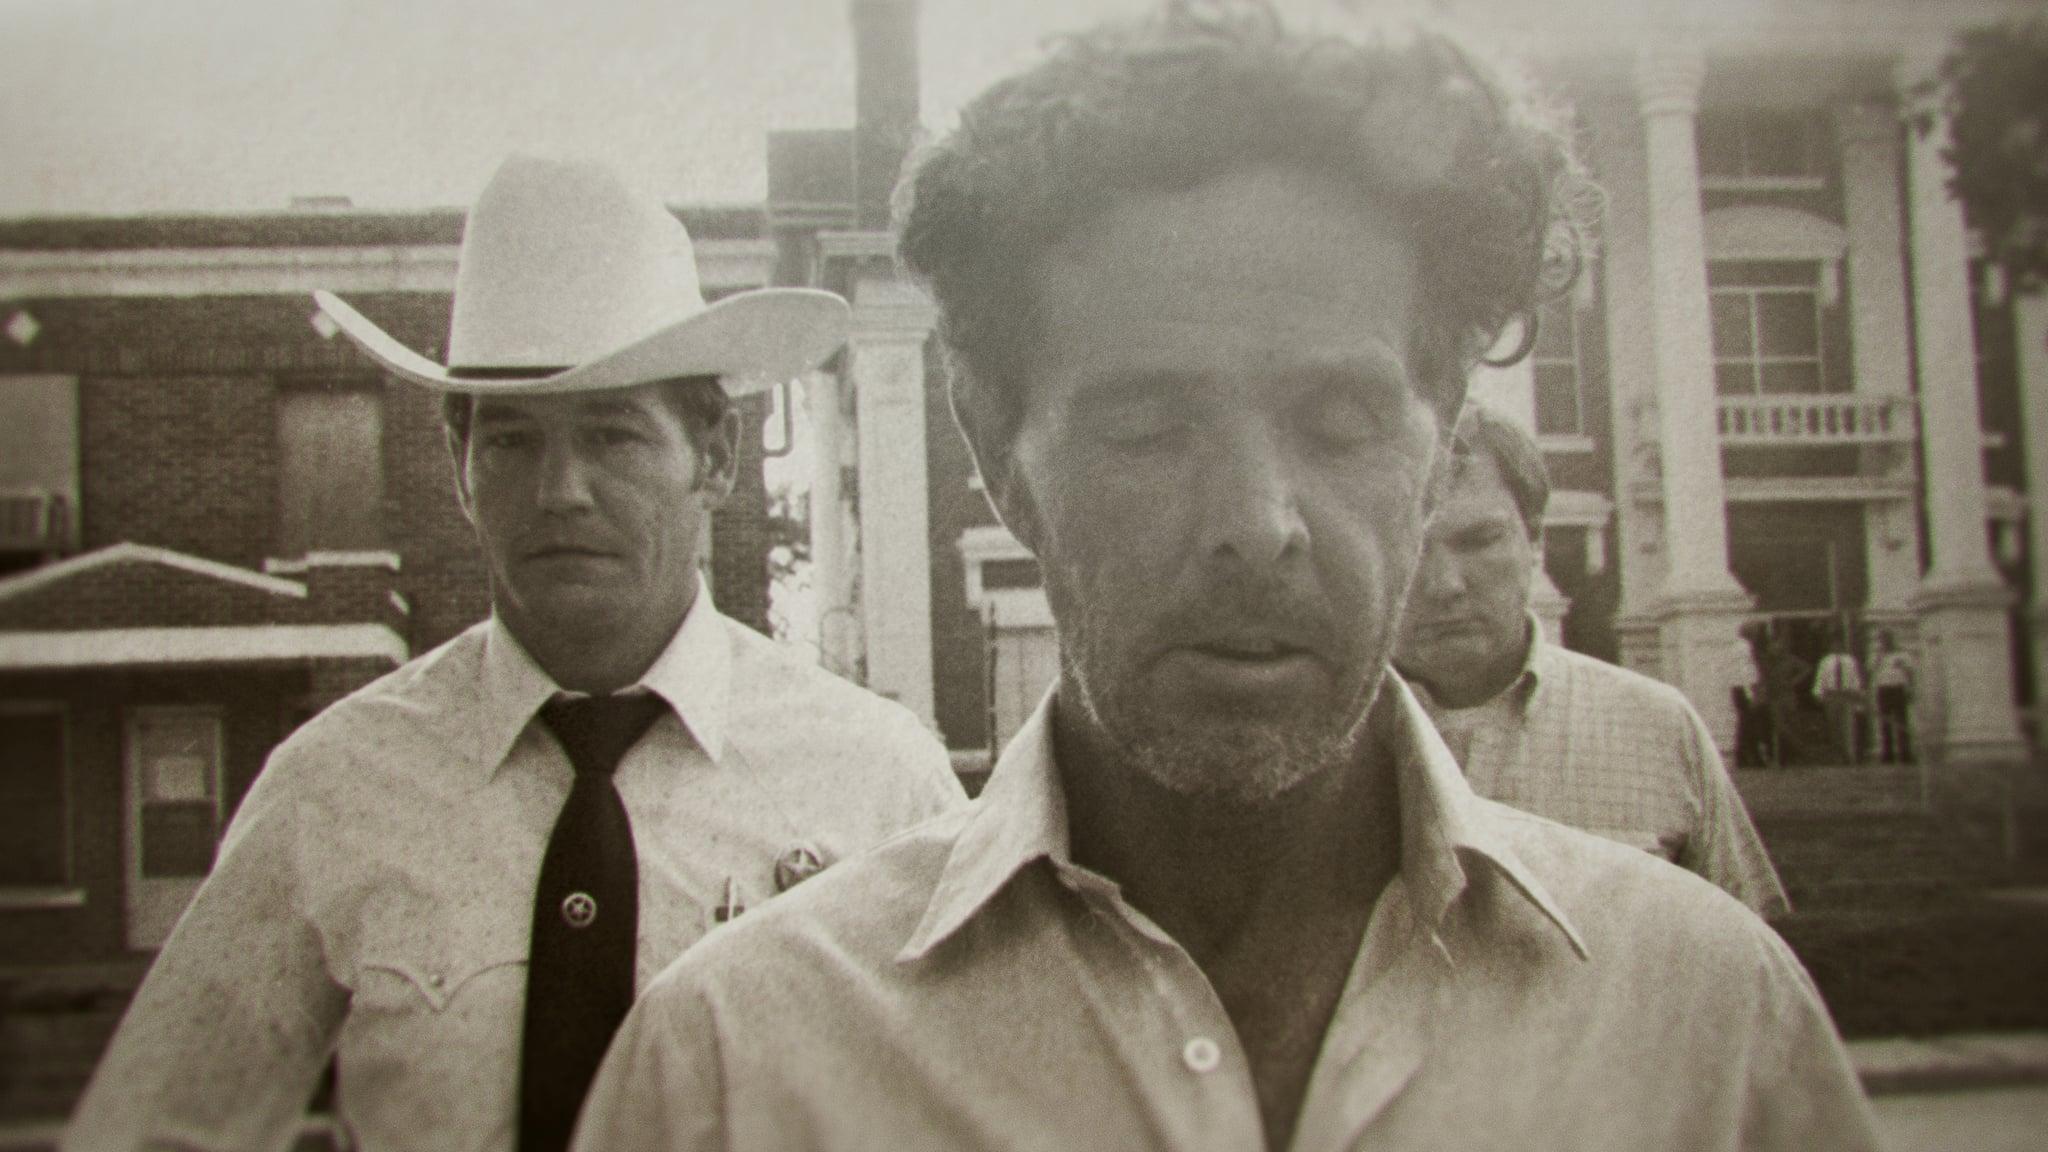 The Confession Killer — Henry Lee Lucas (center) walking in front of Ranger Phil Ryan (left)